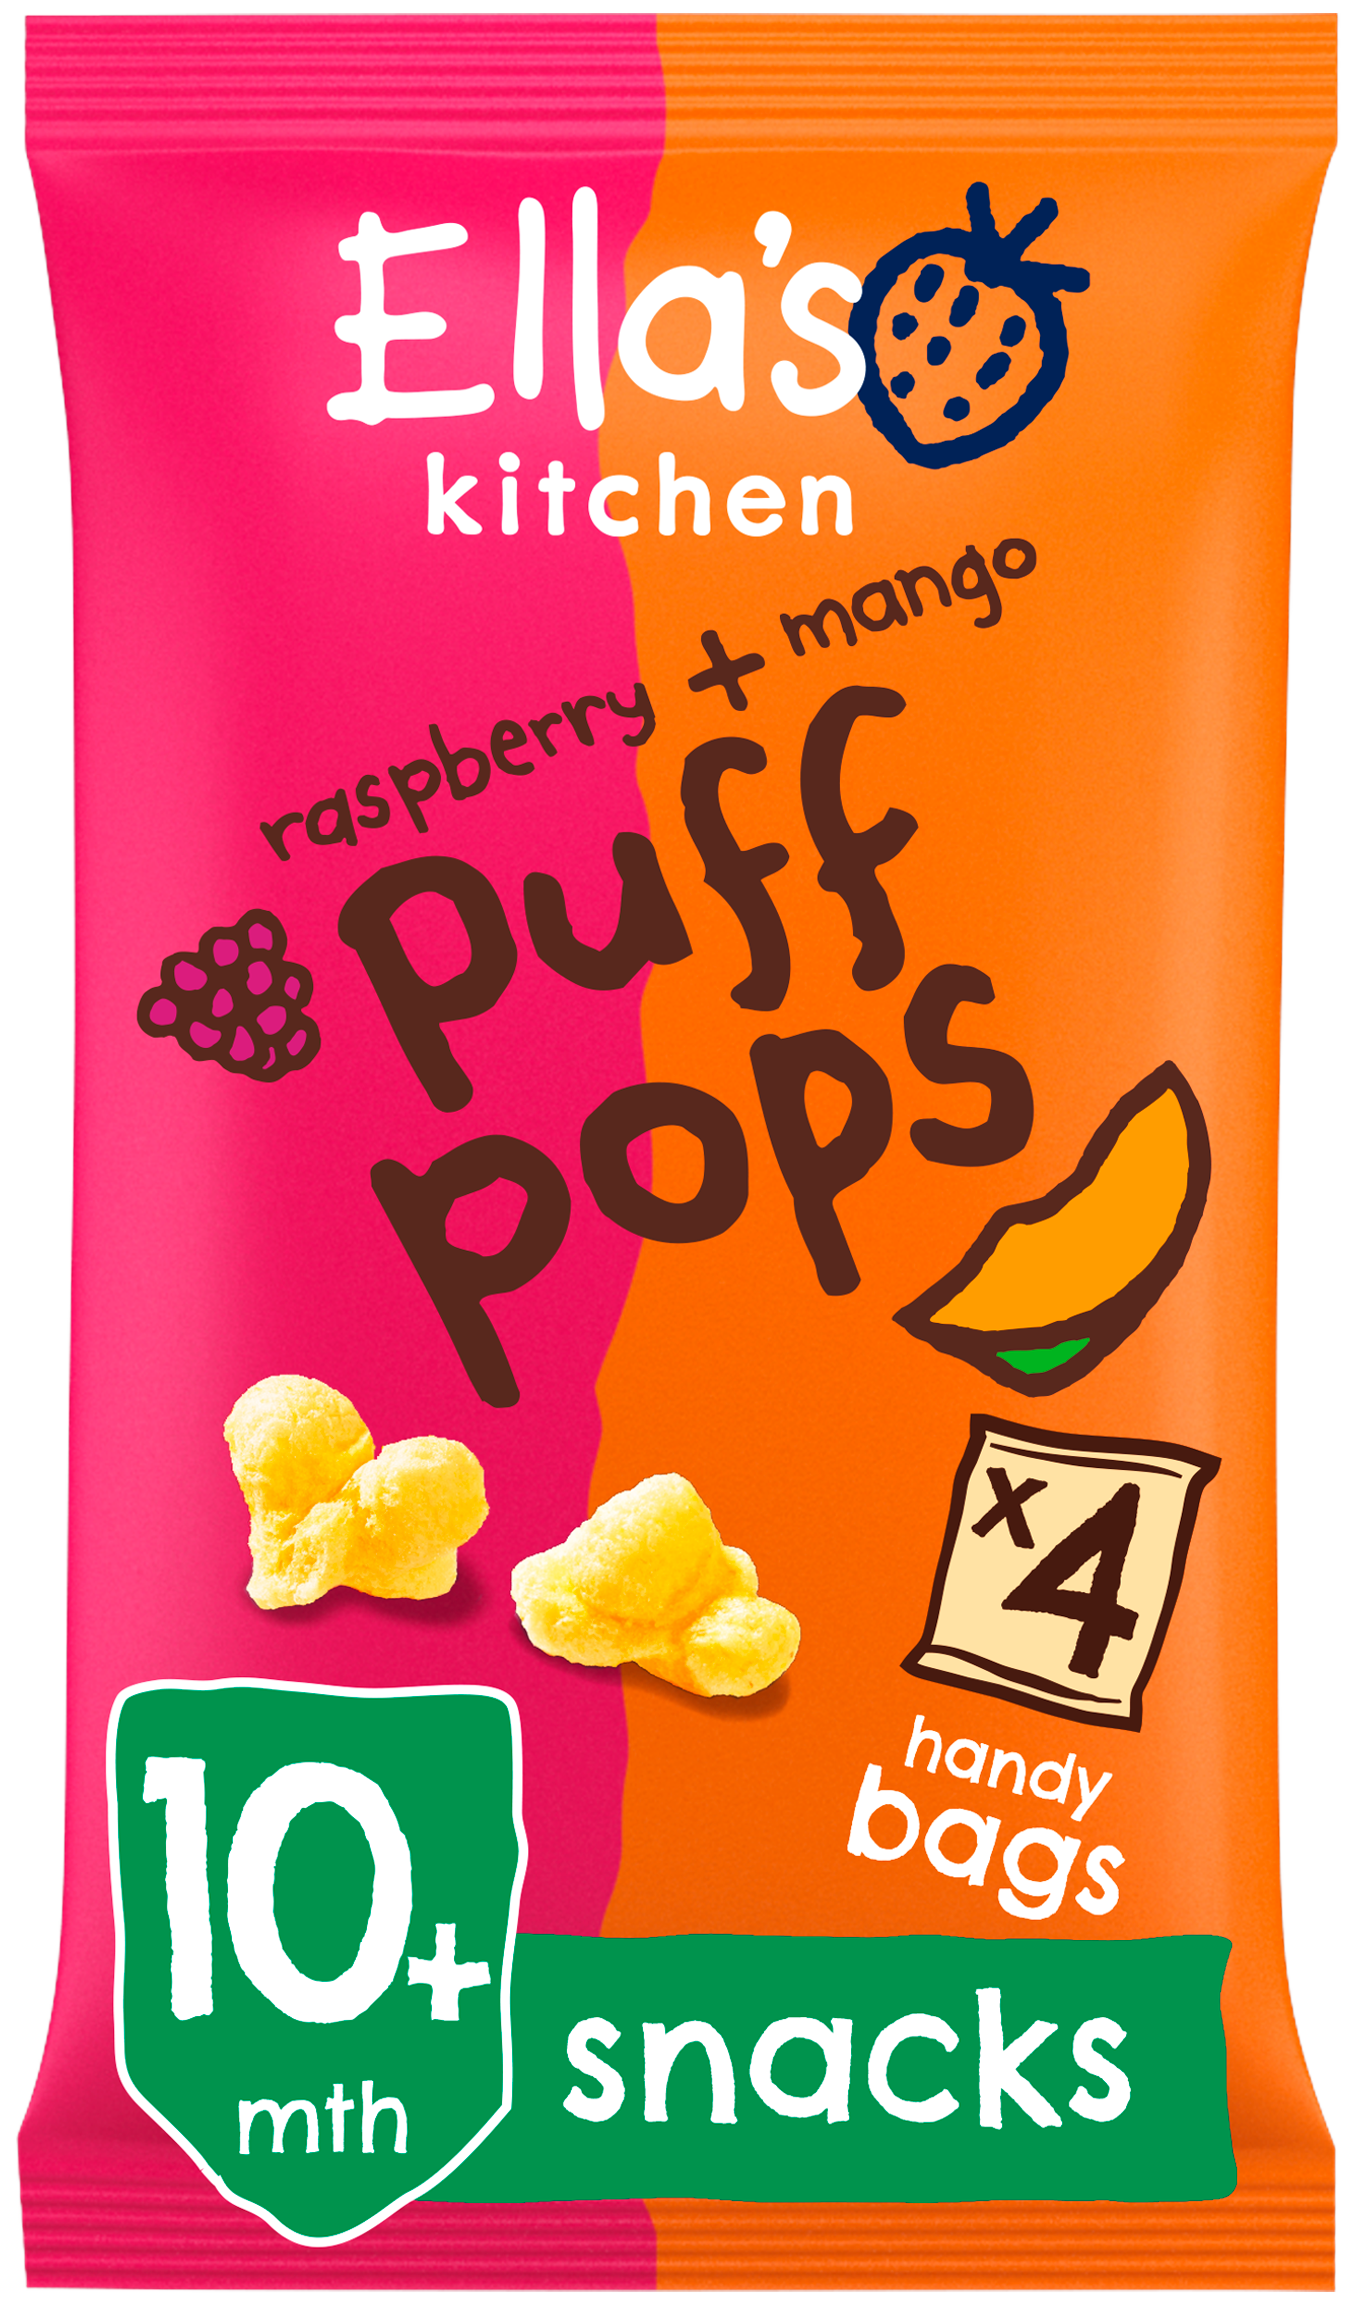 Ellas kitchen puff pops raspberry mango bag front of pack O